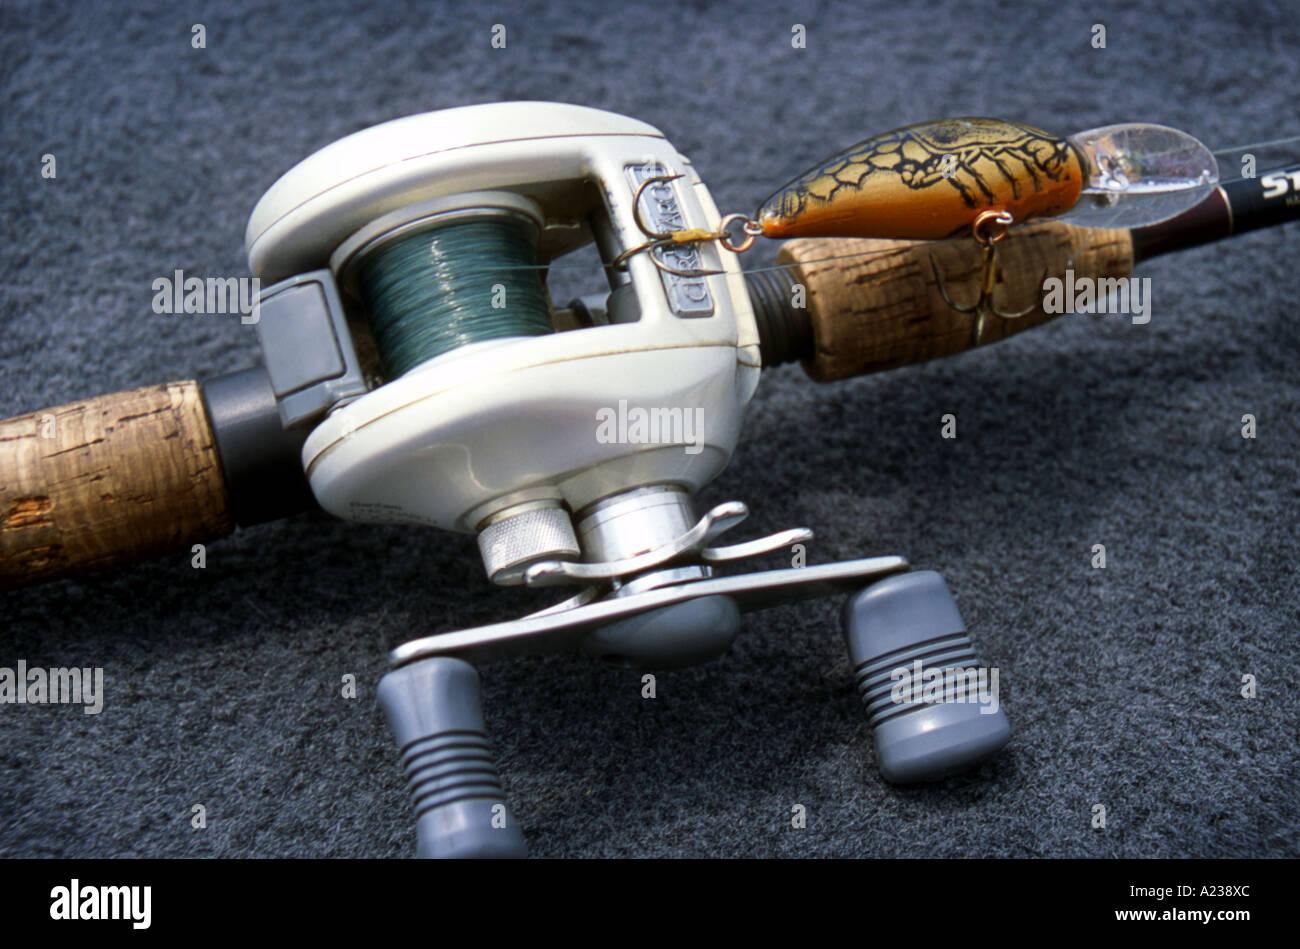 Bass Fishing Rod, Reel & Lure Stock Photo - Alamy